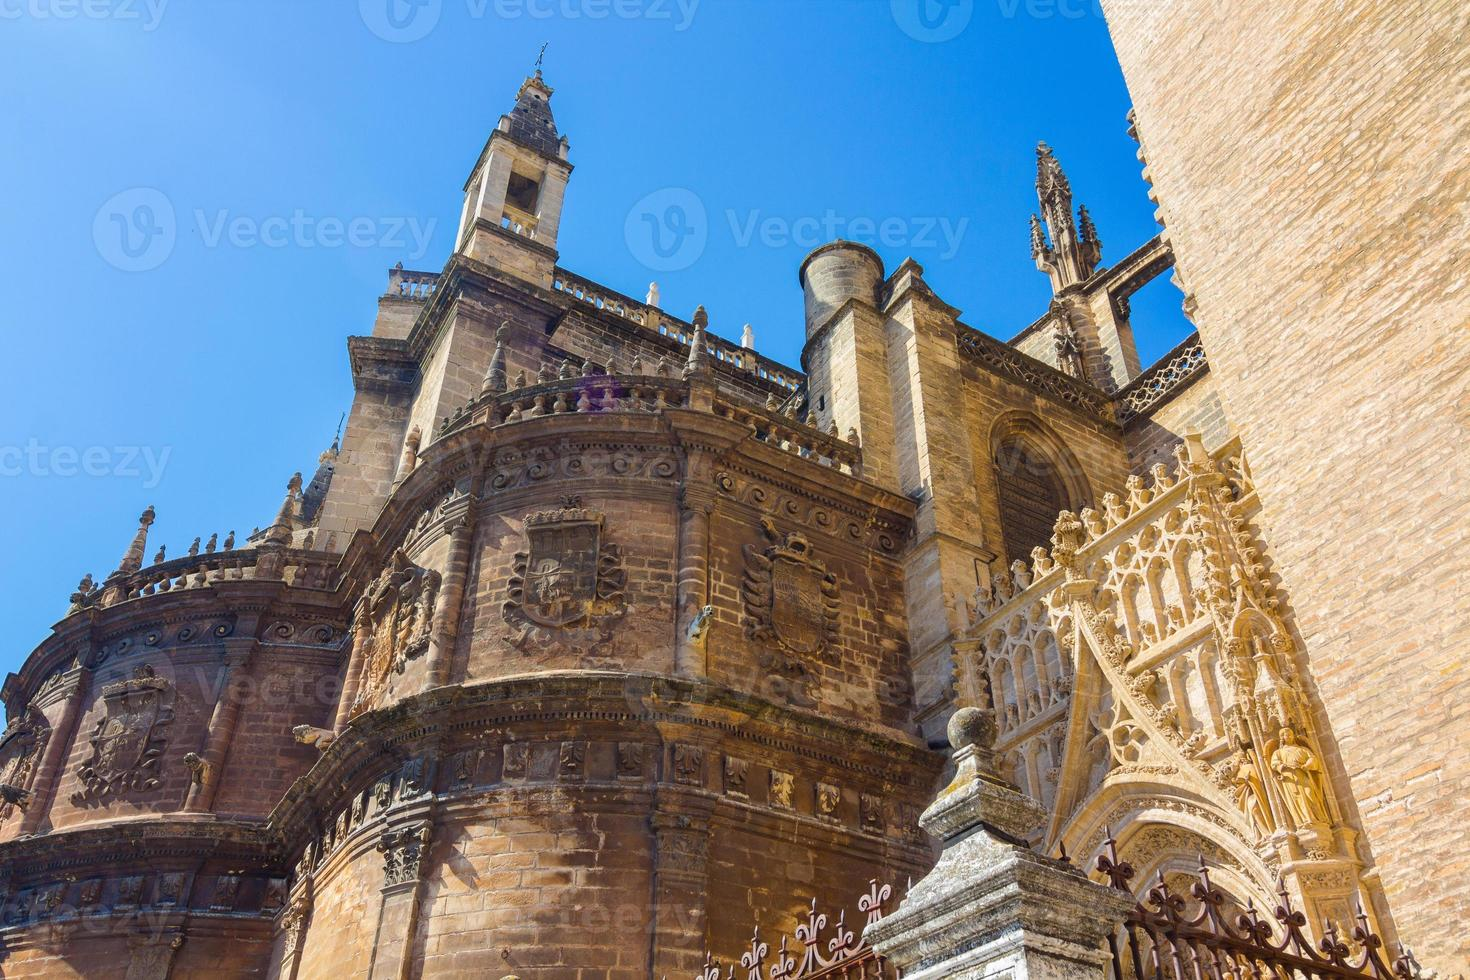 detalles de la fachada la catedral santa maria la giralda foto